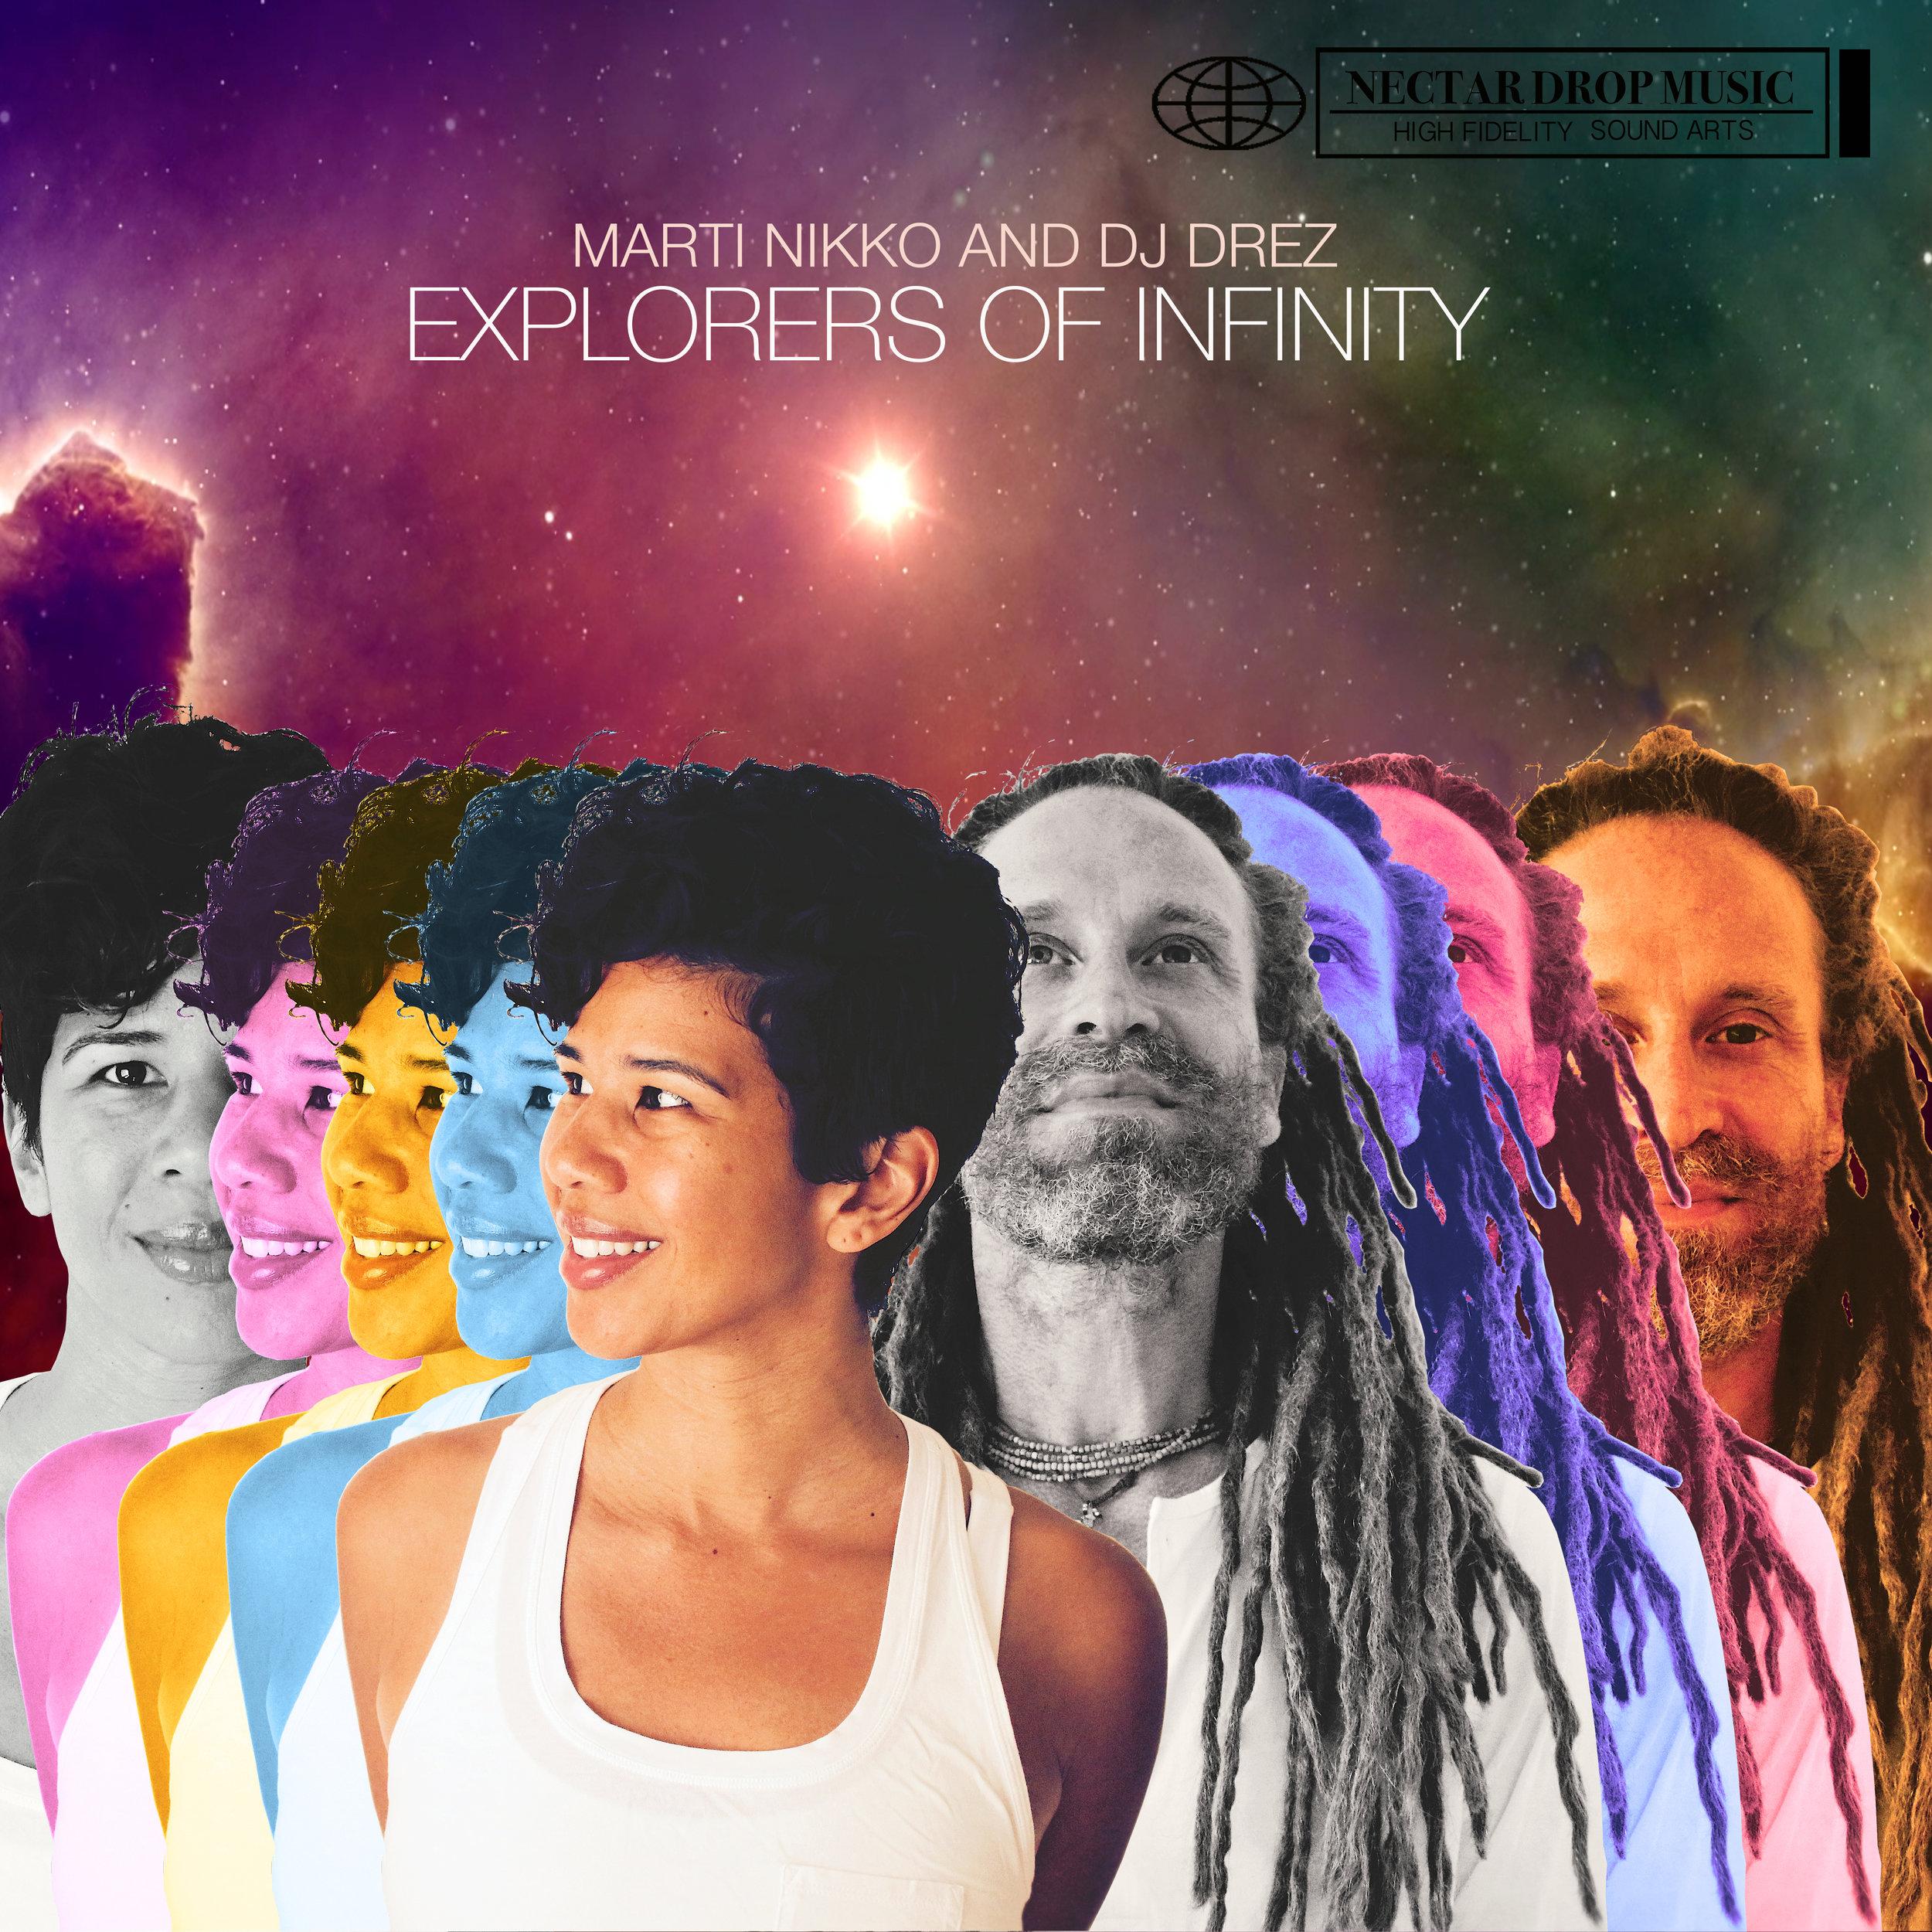 Explorers of Infinity Marti Nikko & DJ Drez